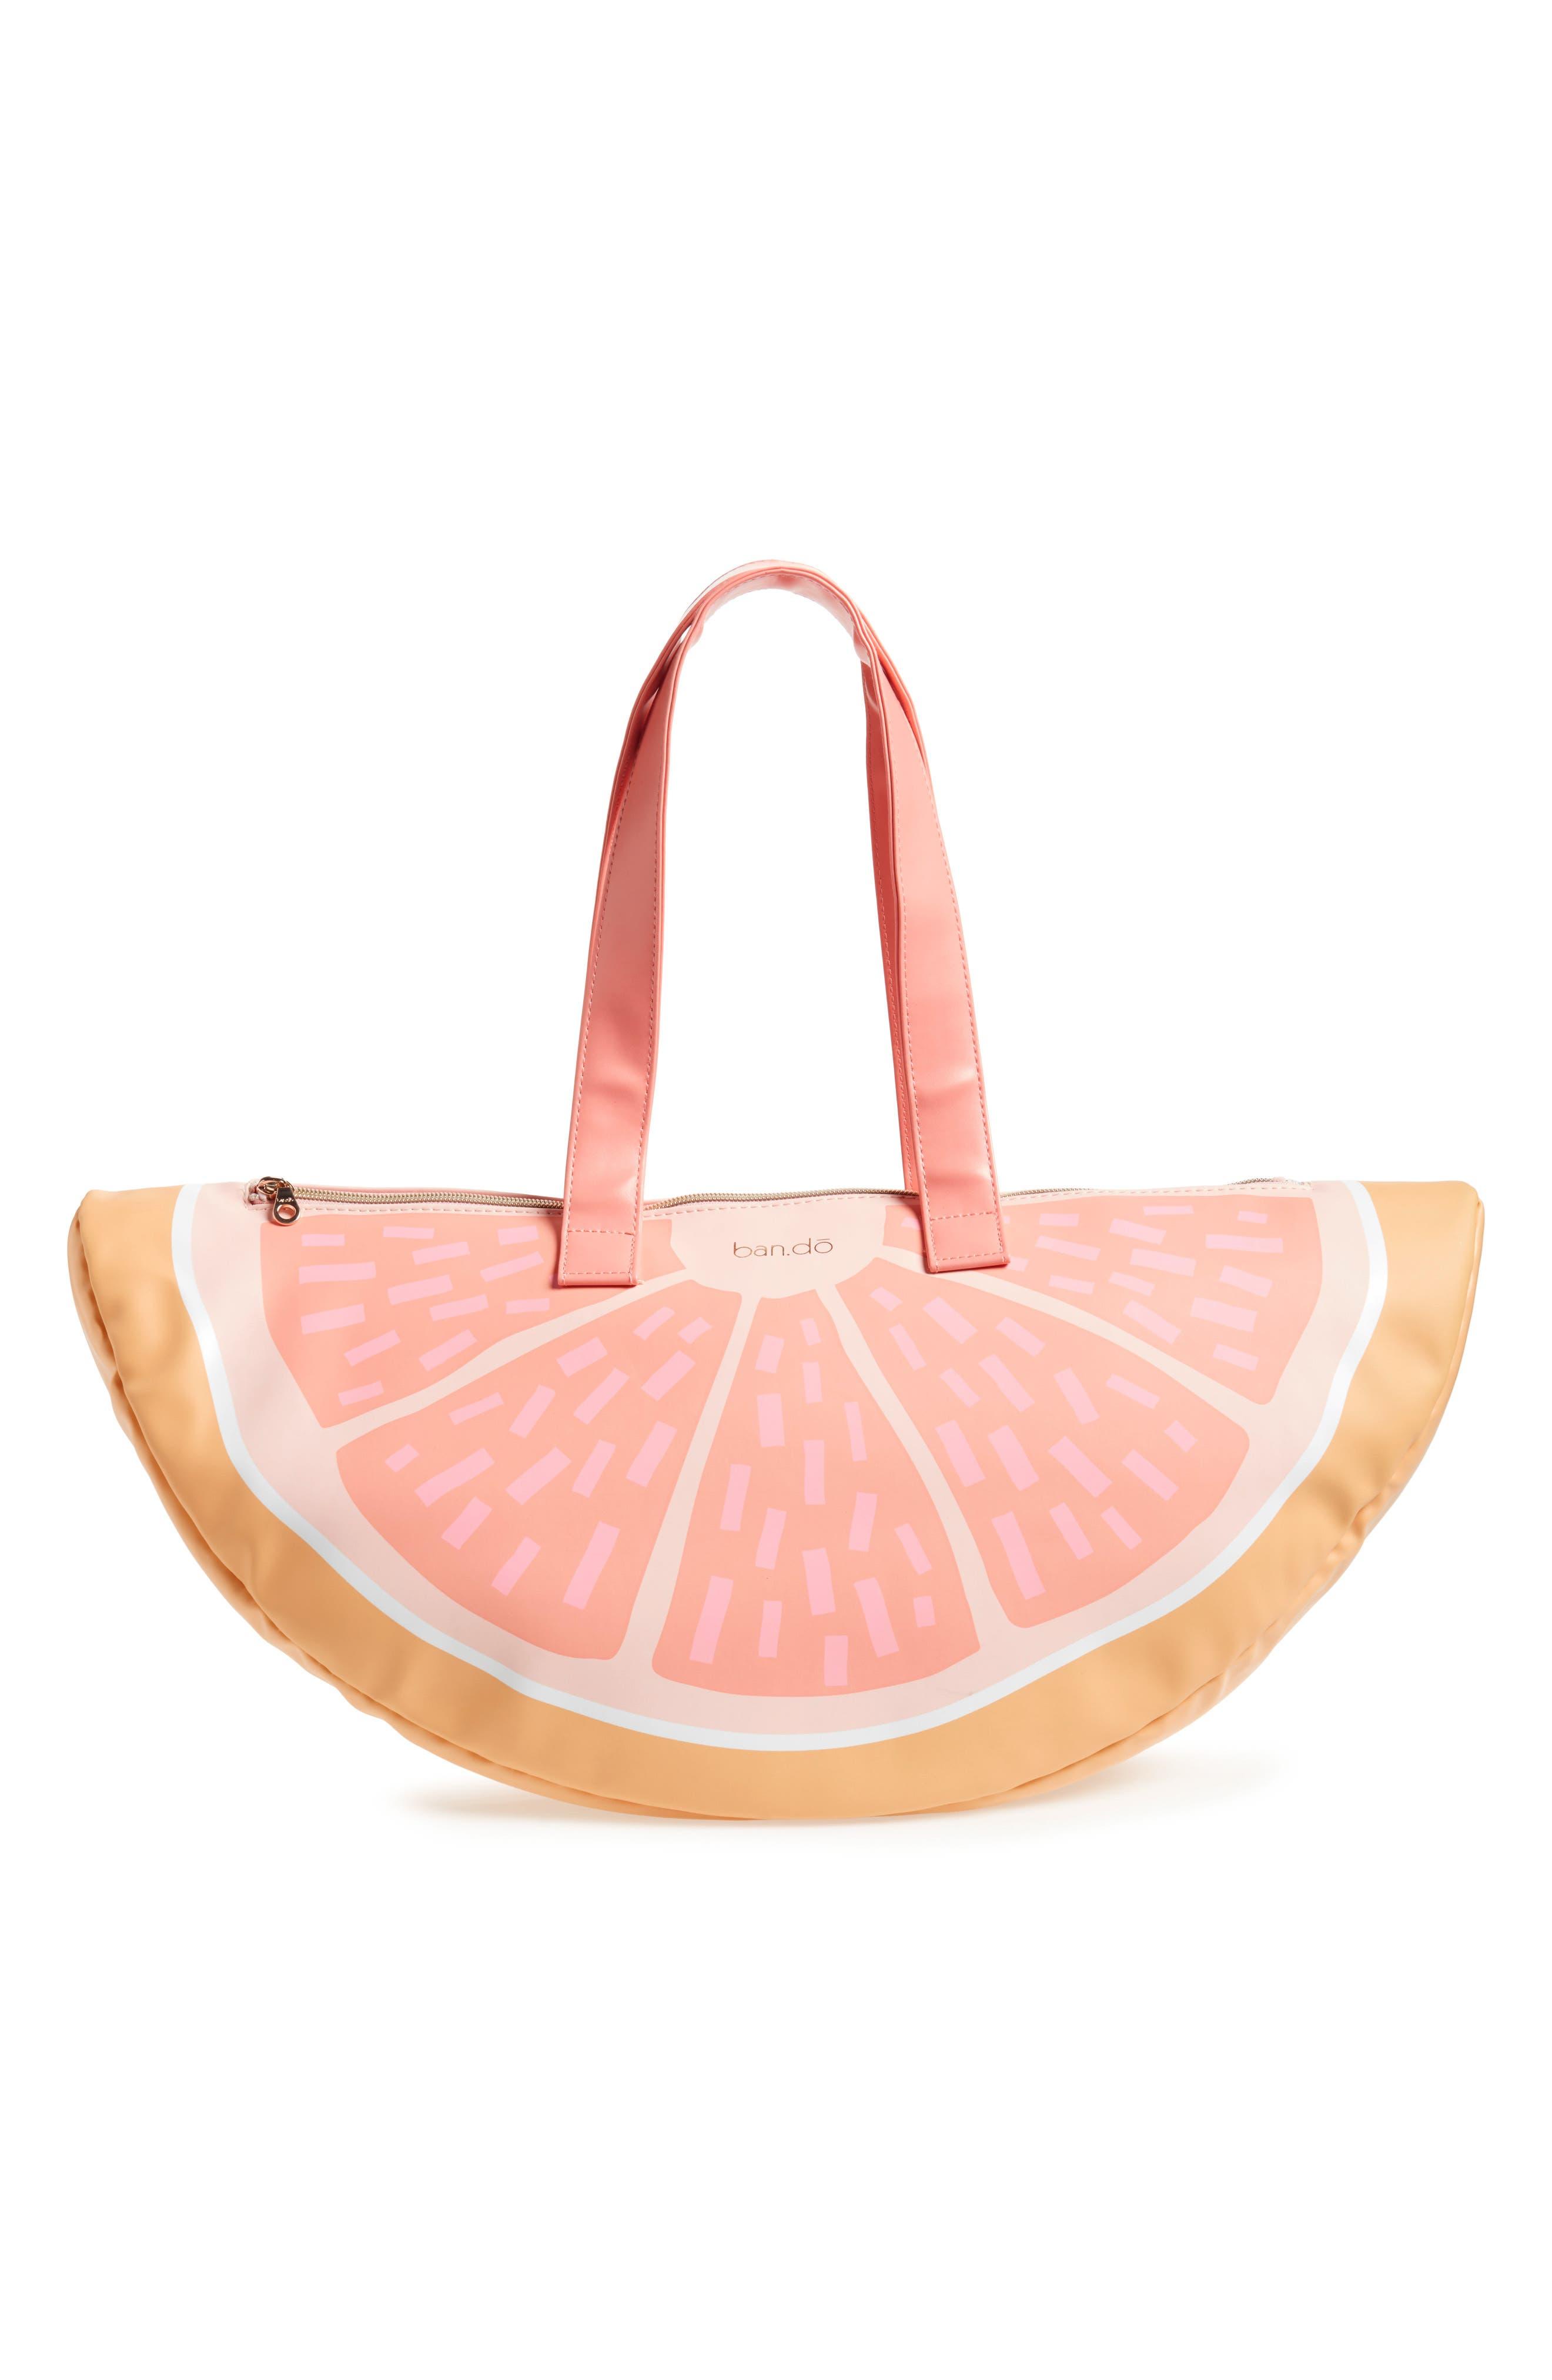 Grapefruit Cooler Bag,                             Main thumbnail 1, color,                             Coral